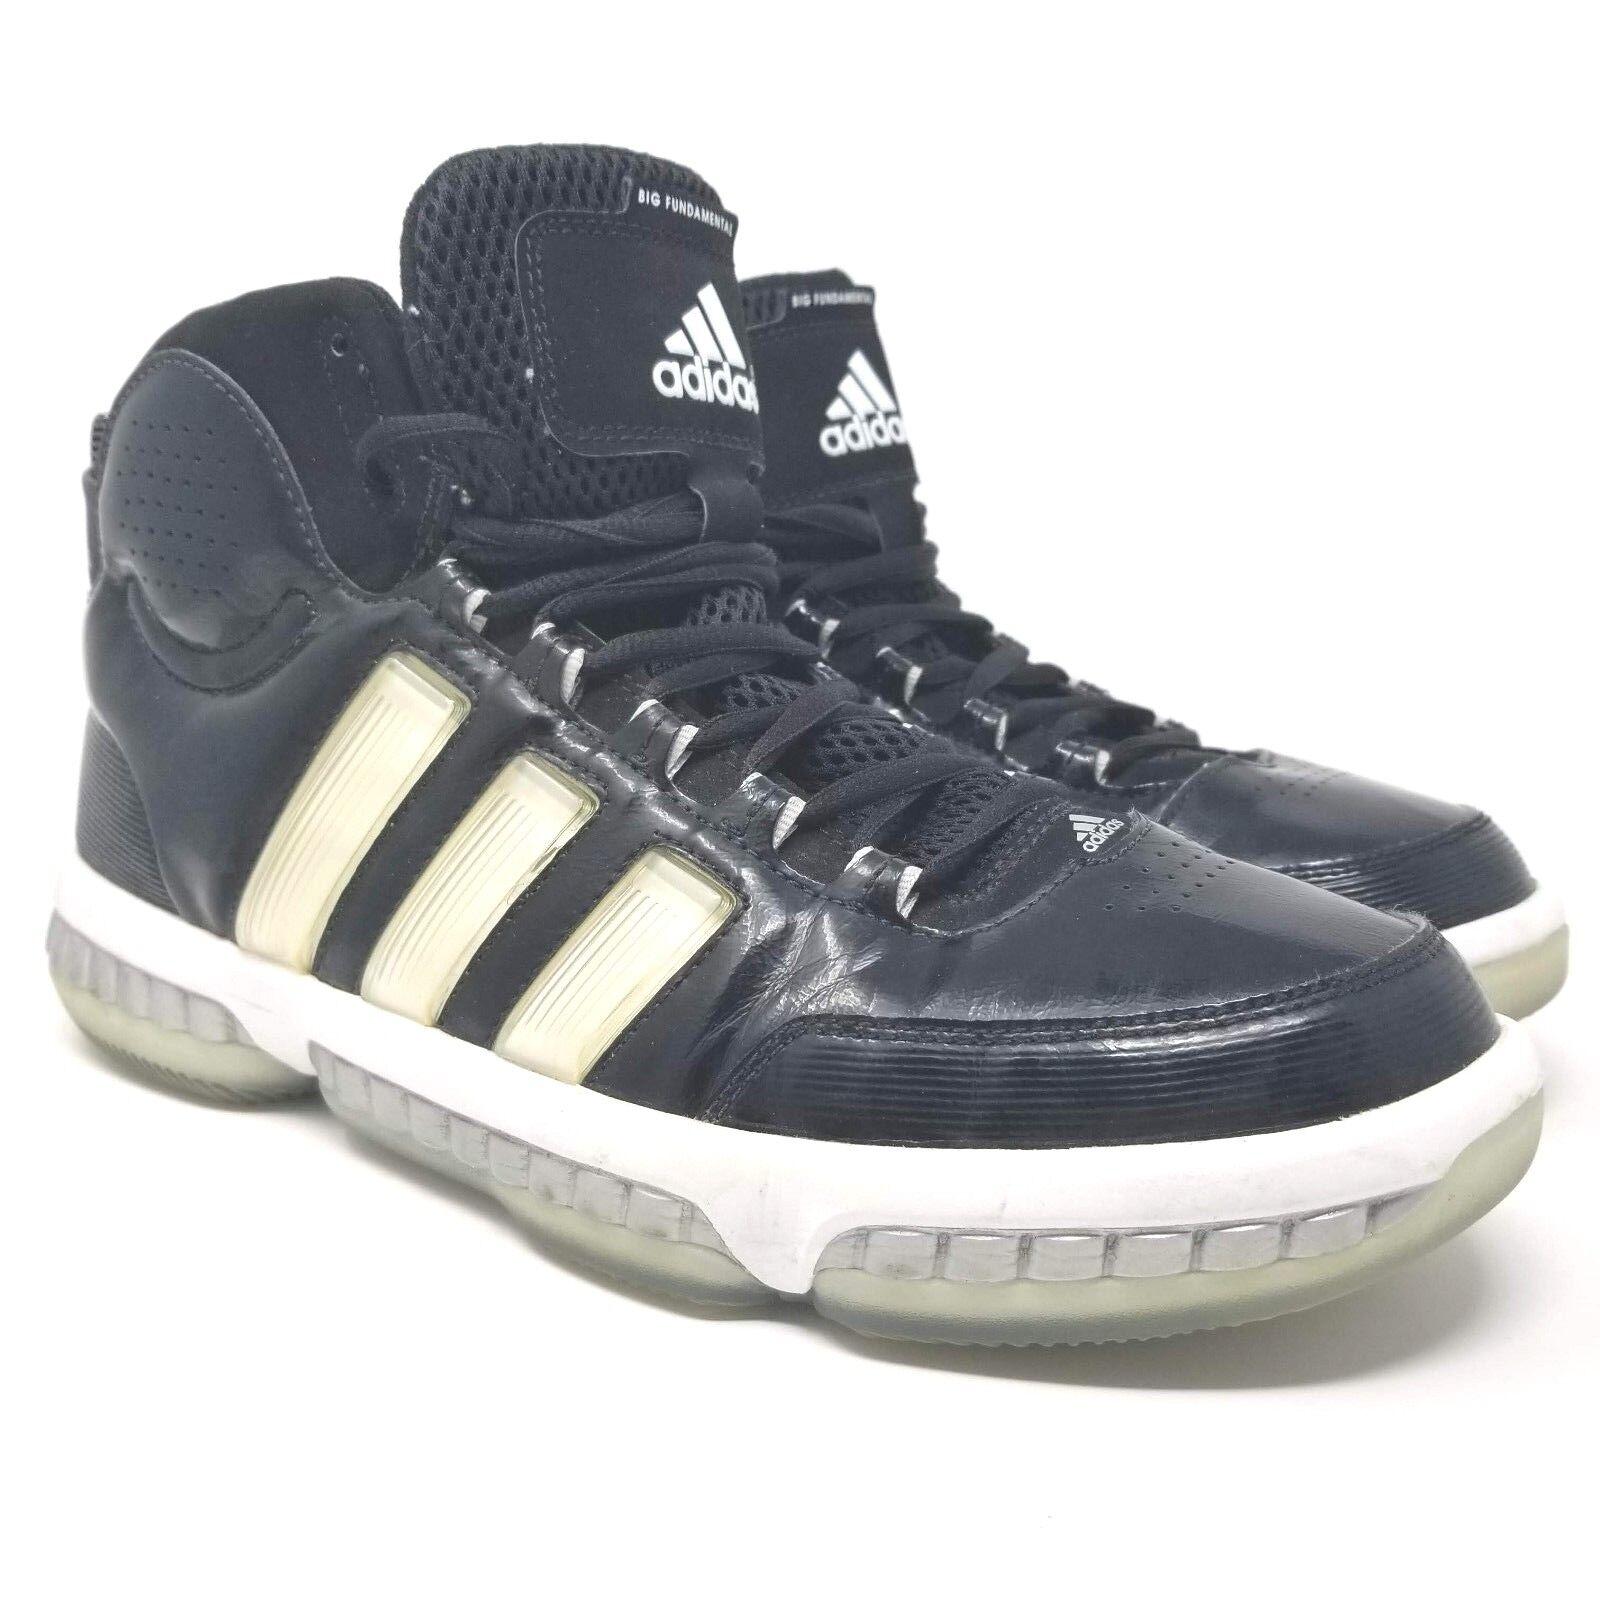 Adidas Big Fundamental Tim Duncan G24826 Size 11.5 Black Basketball Sneakers